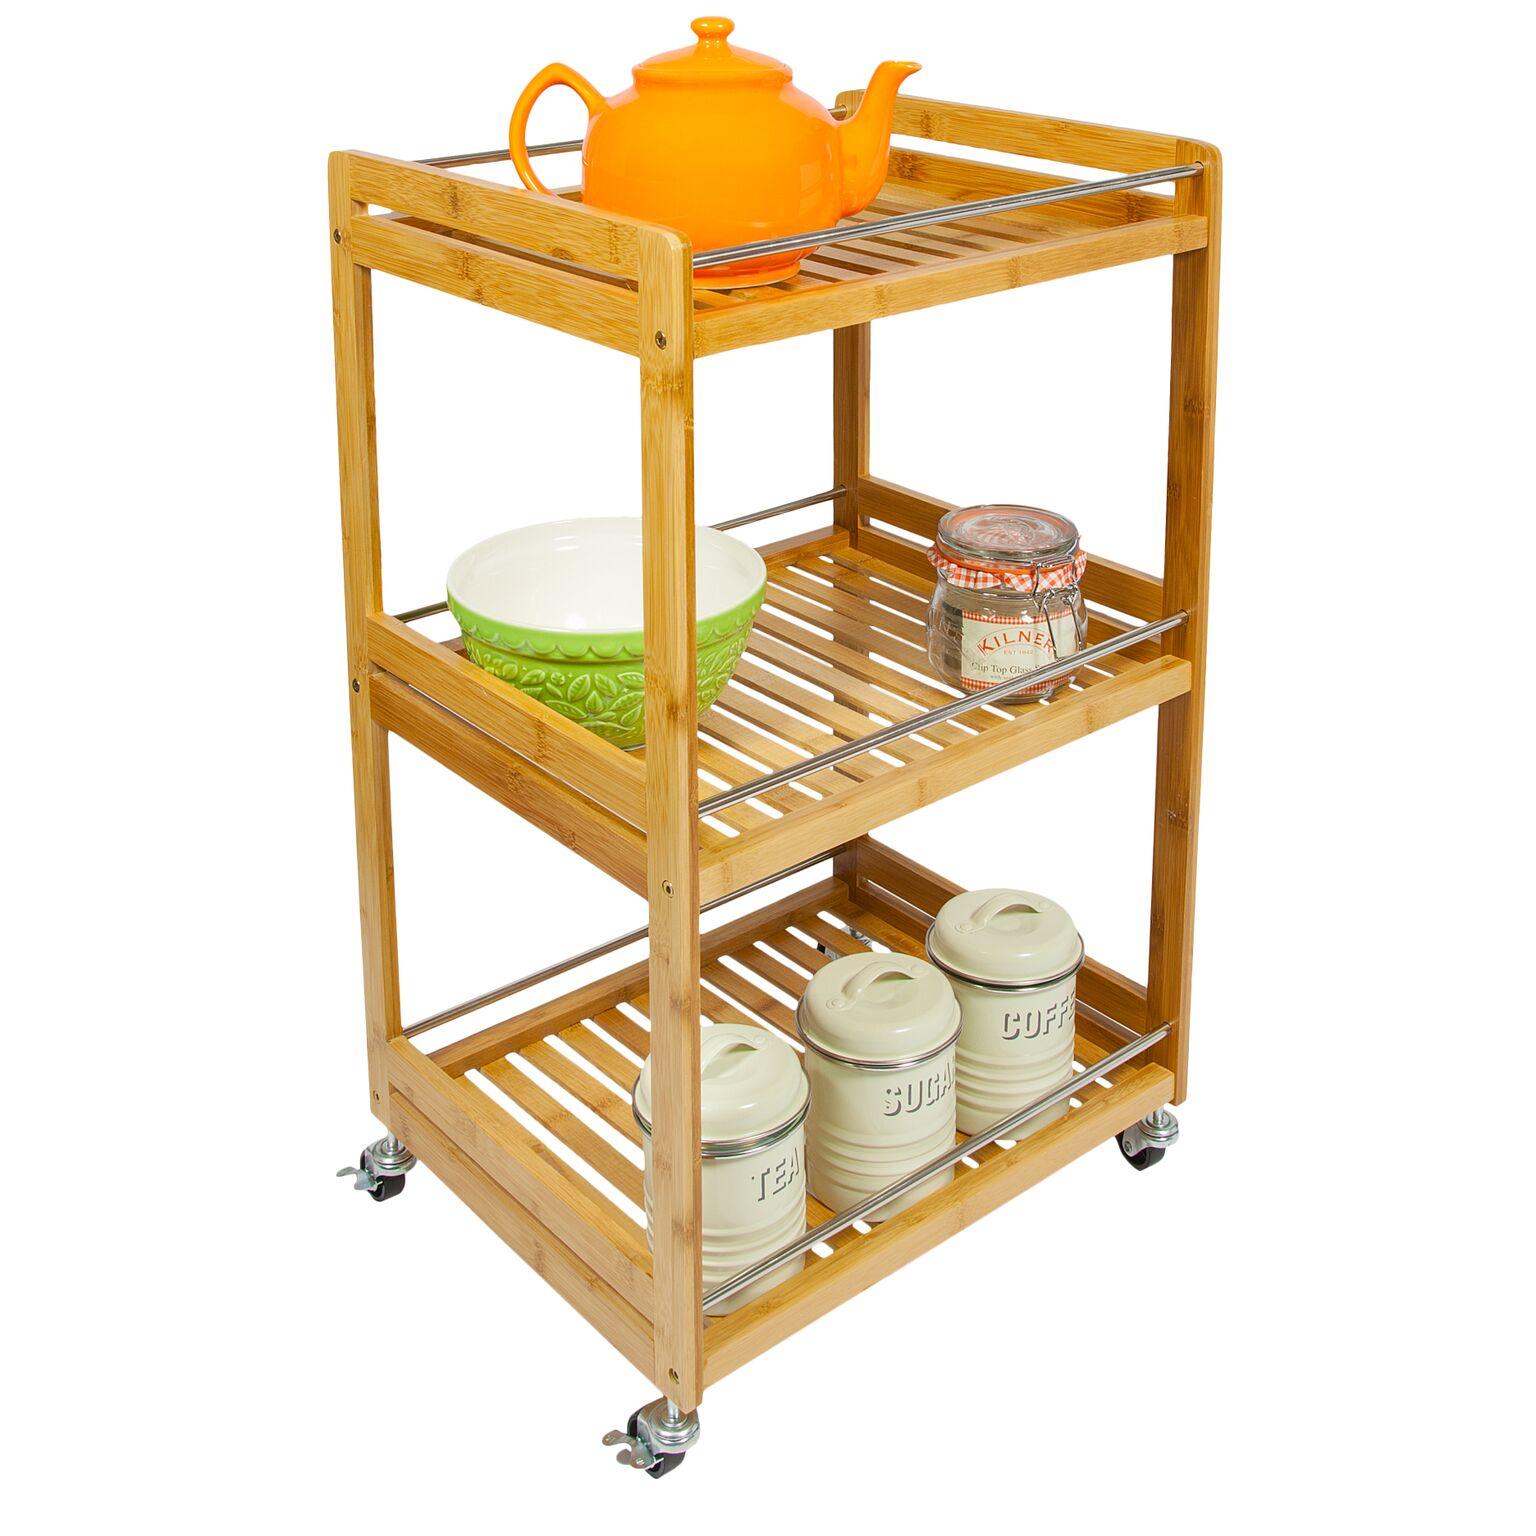 Kitchen Island On Wheels Uk: Woodluv Bamboo 3 Tier Kitchen Storage Serving Trolley